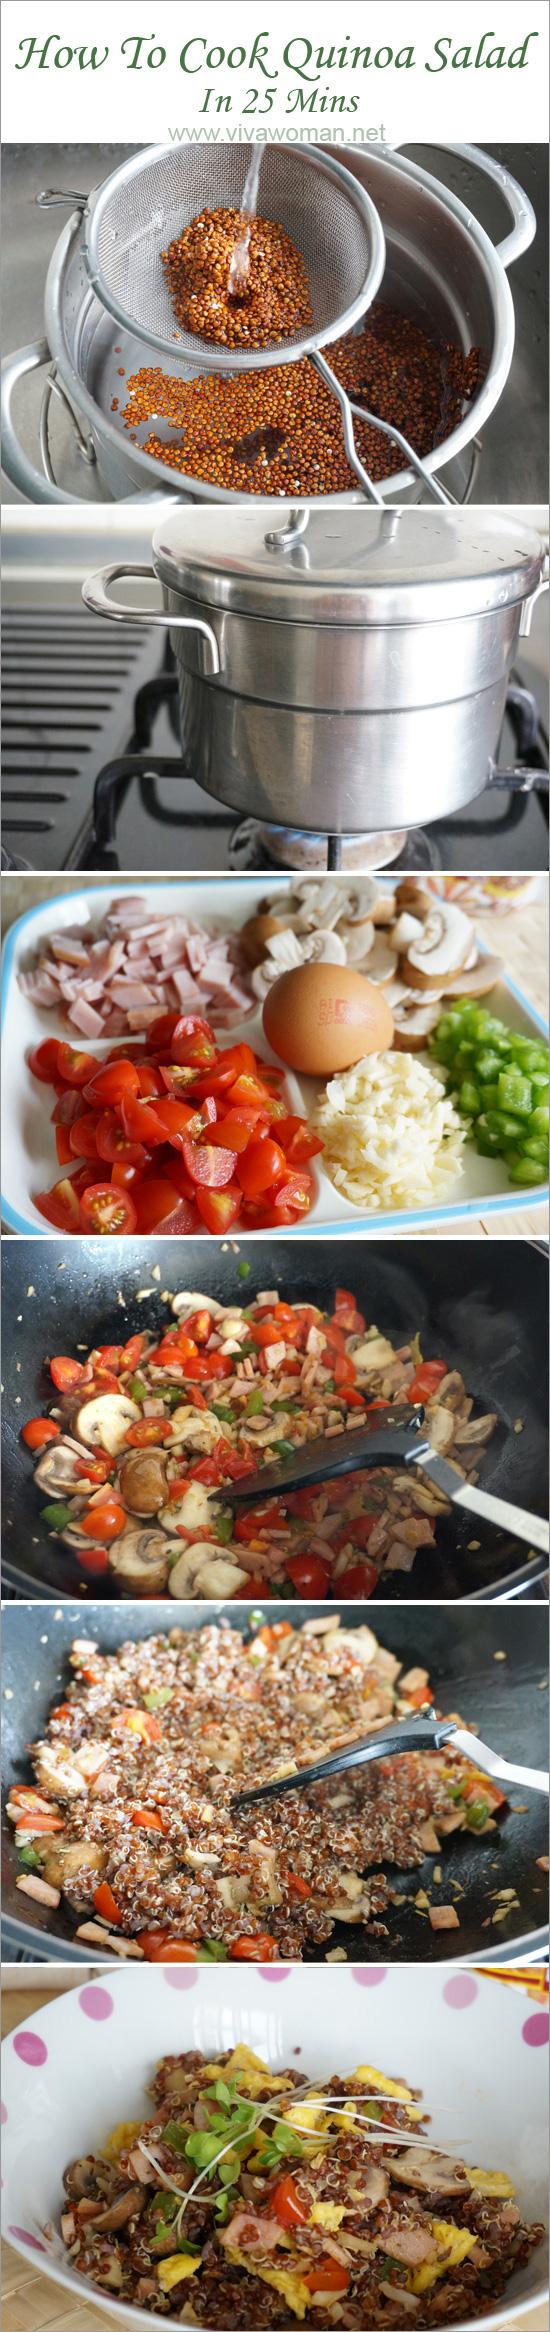 how-to-cook-quinoa-salad